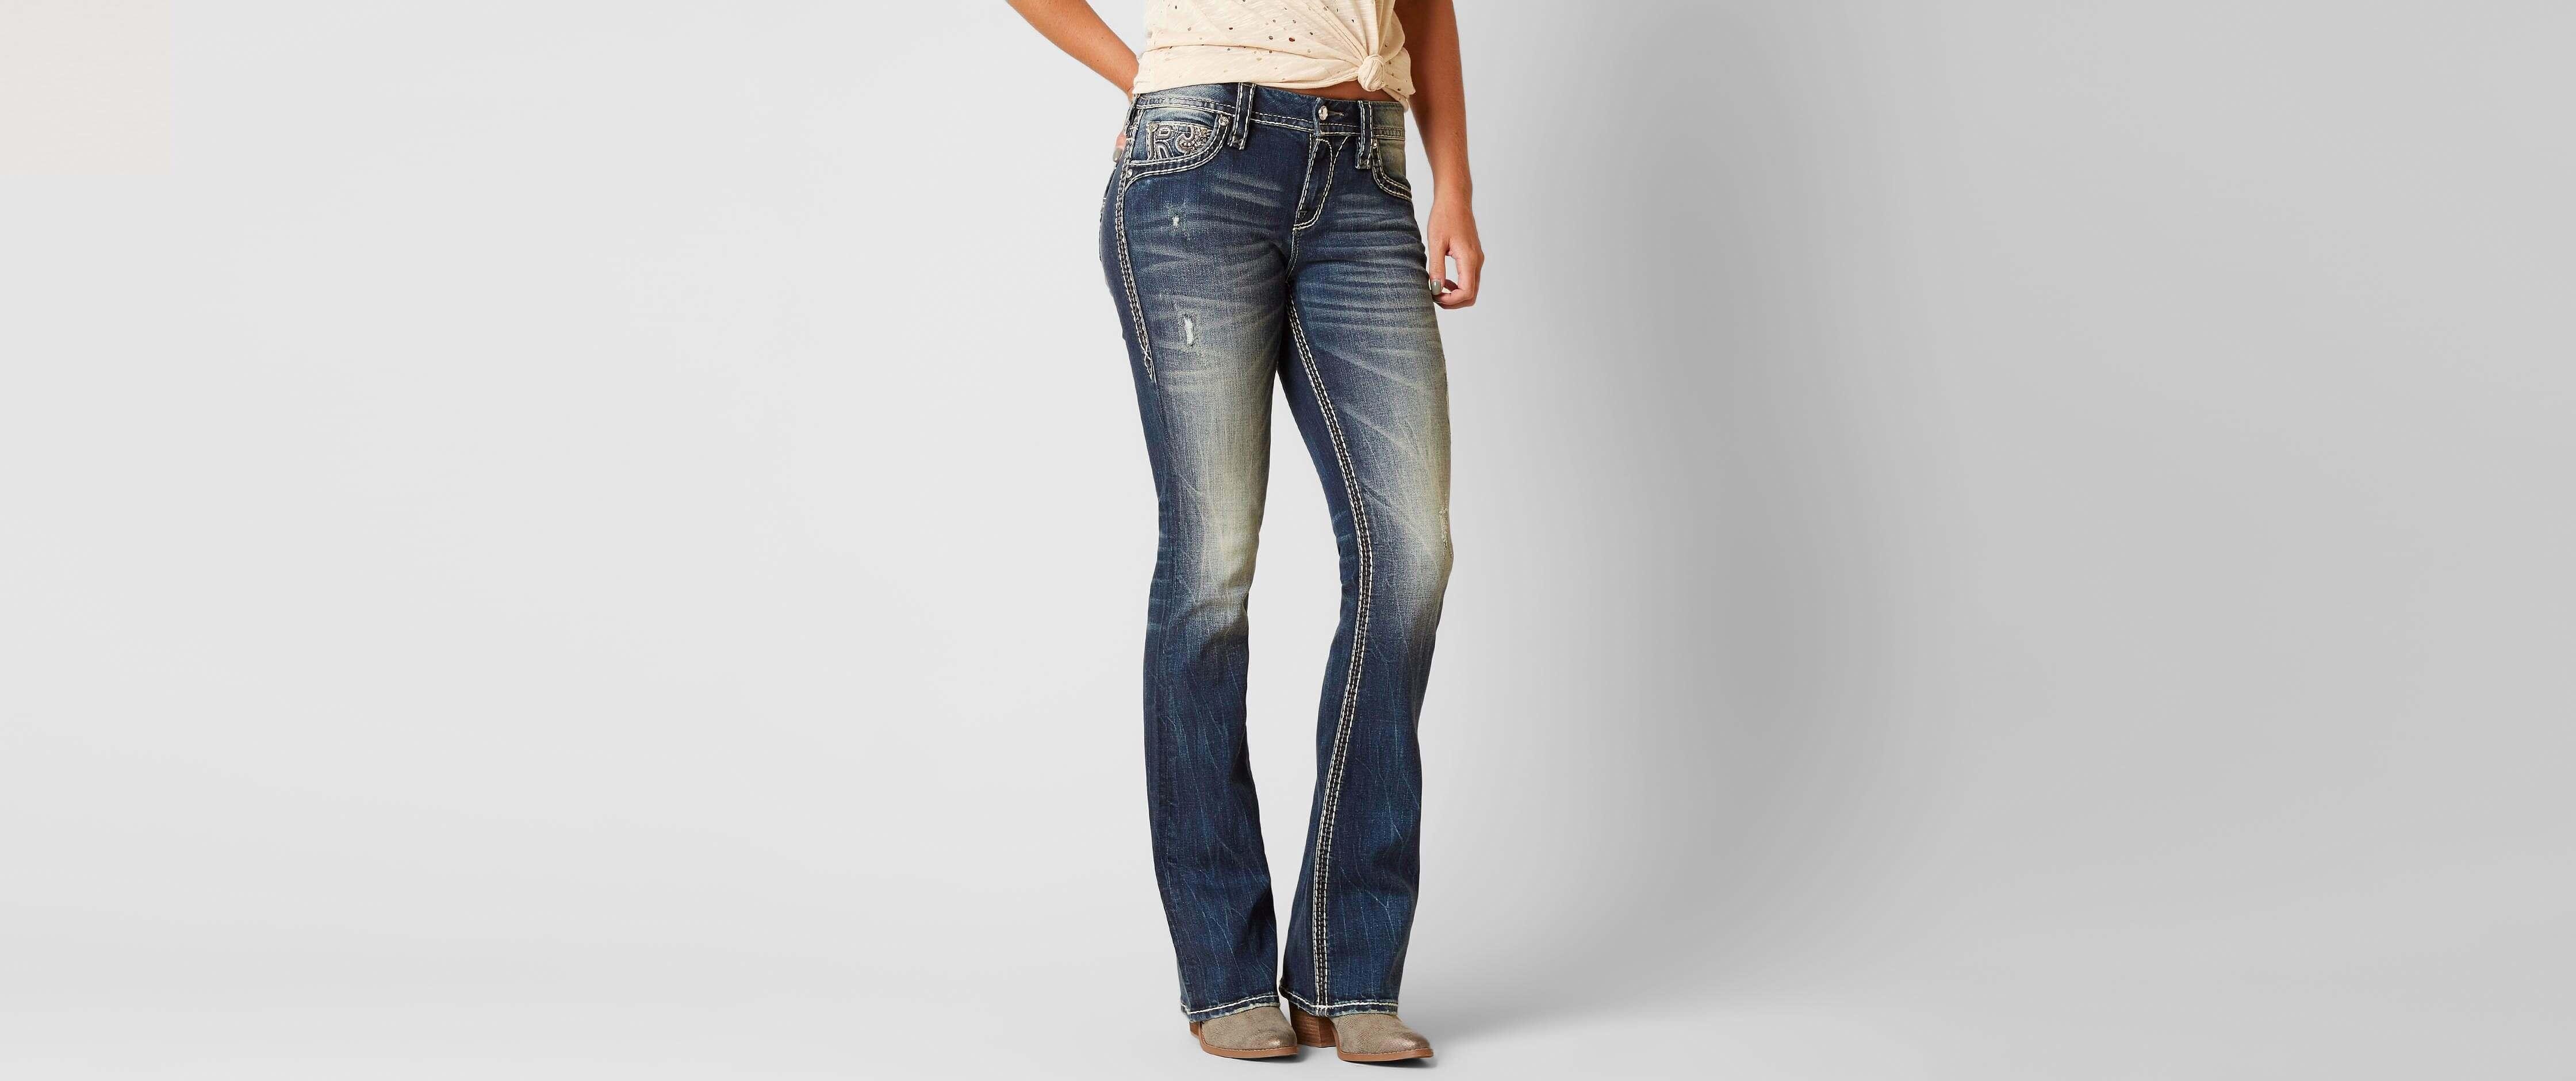 Jeans rock jeans